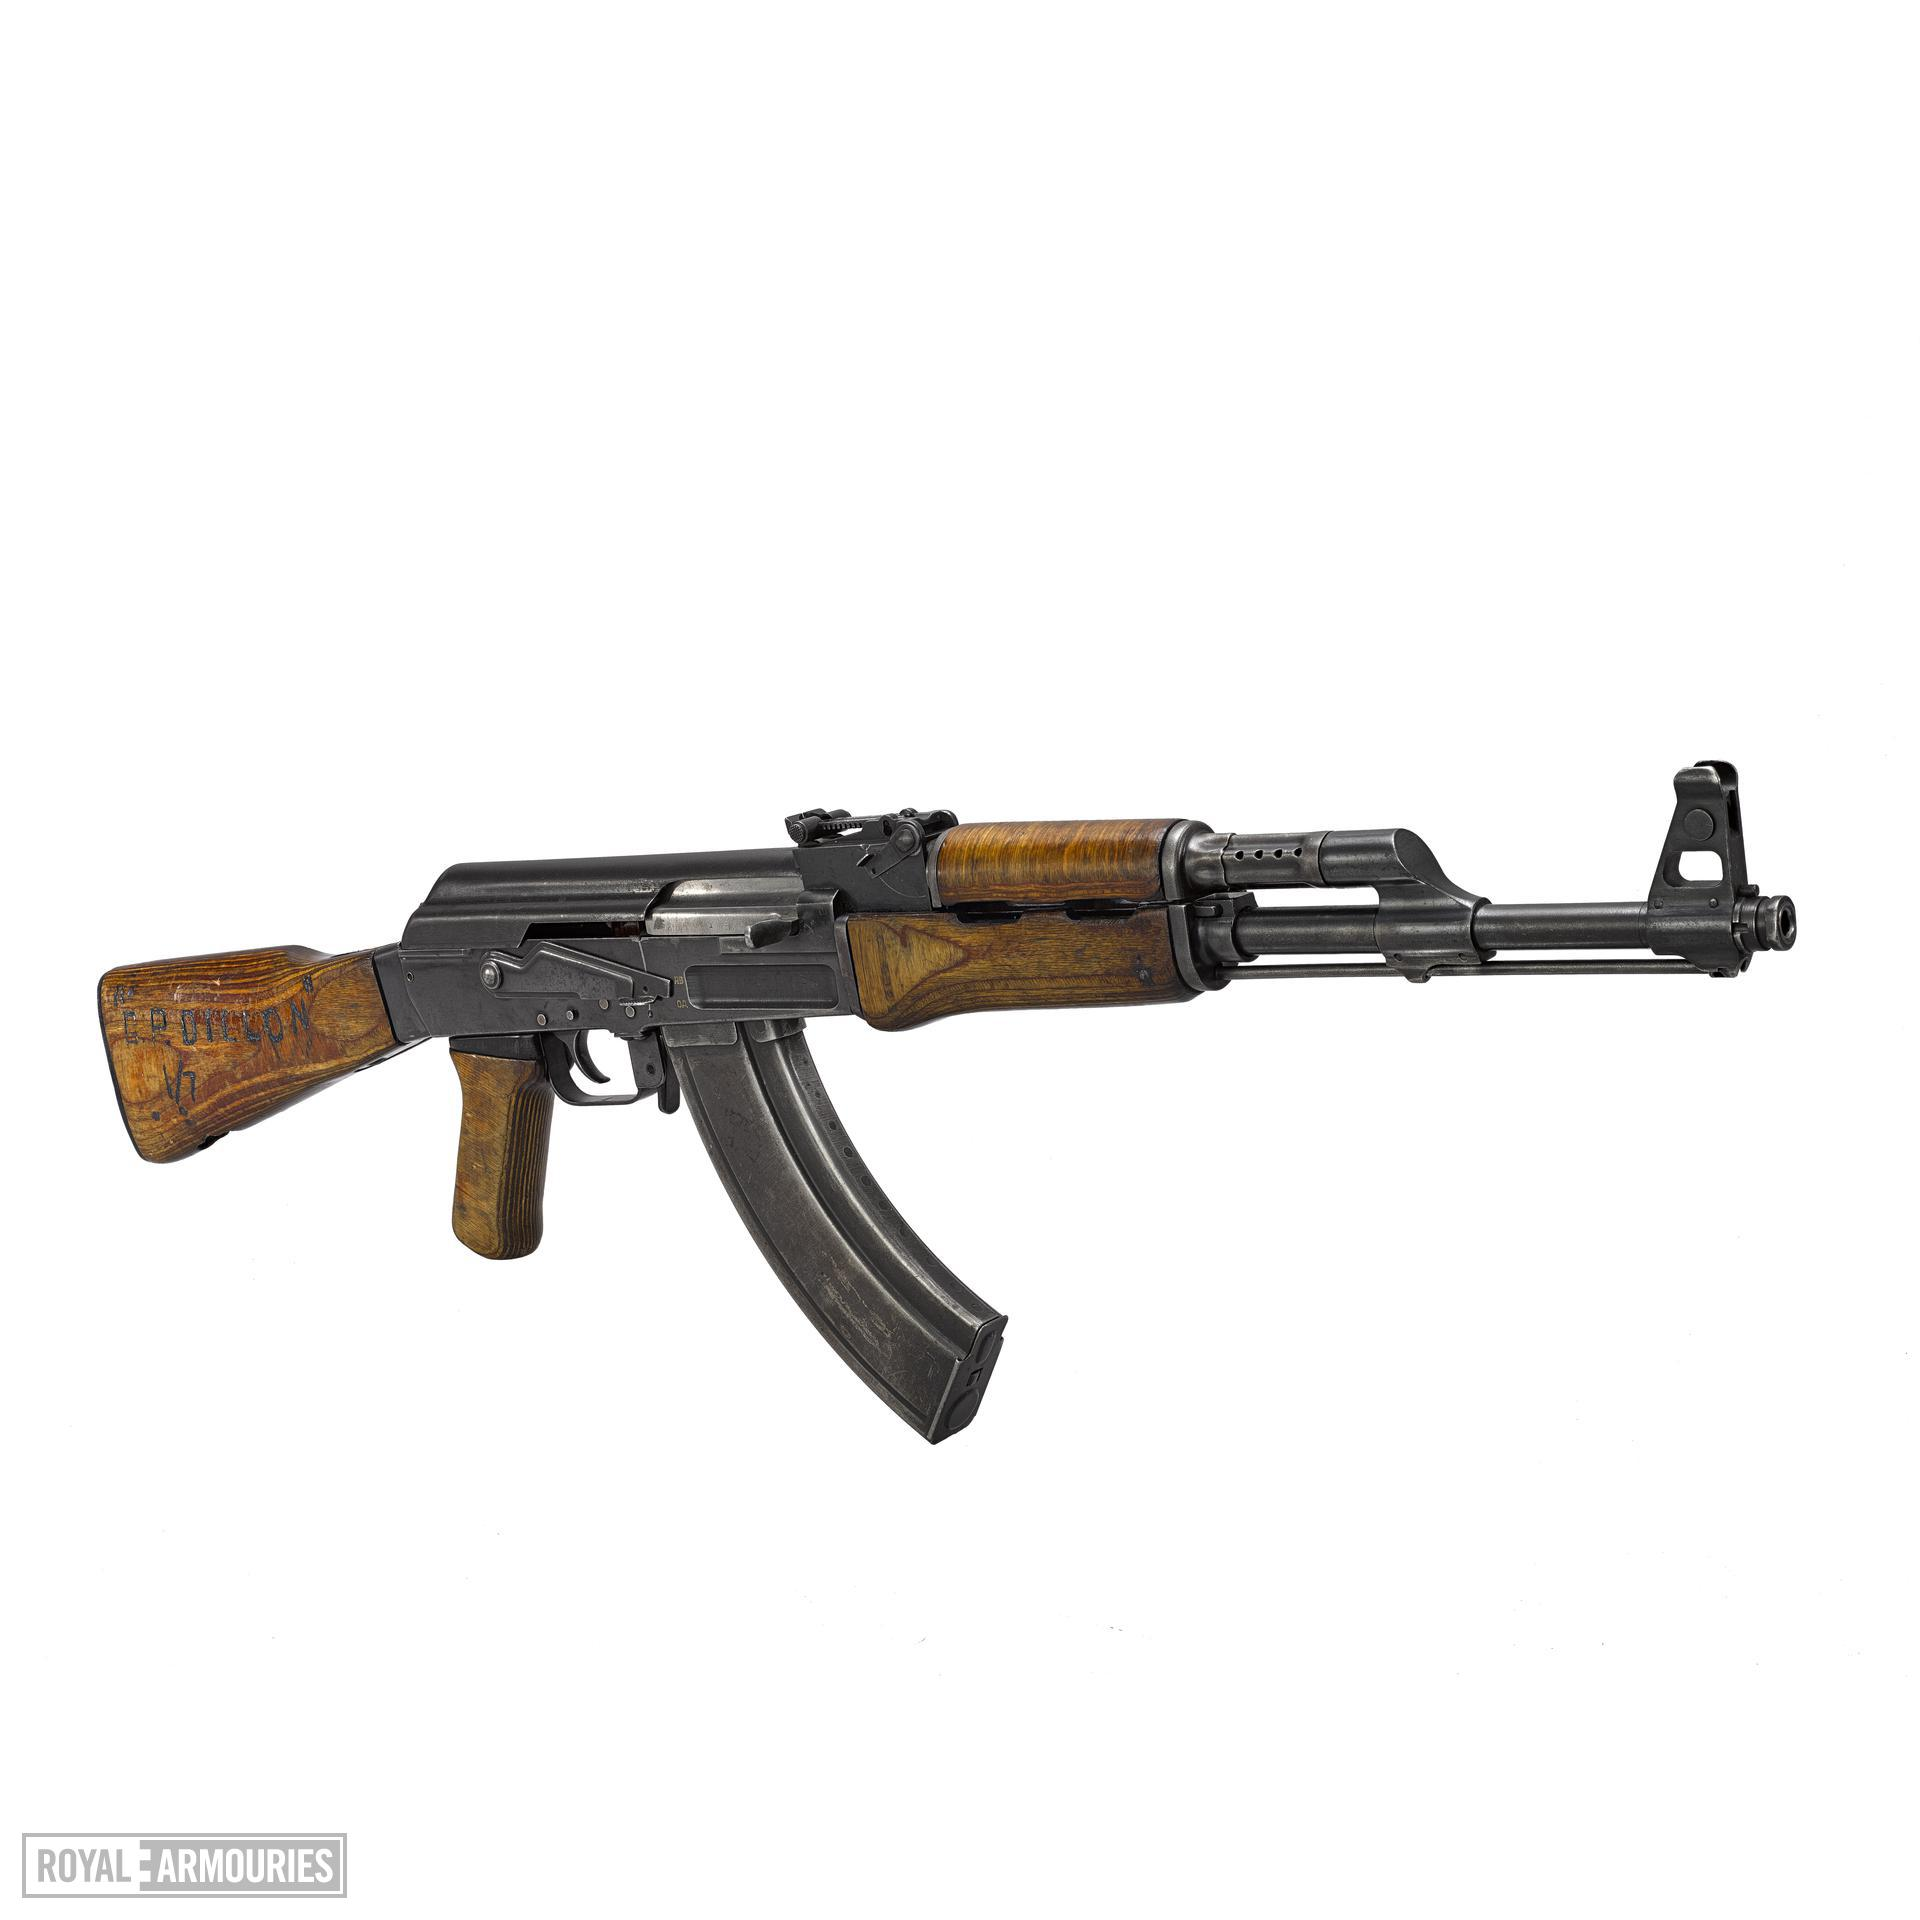 Centrefire automatic rifle - Kalashnikov AK